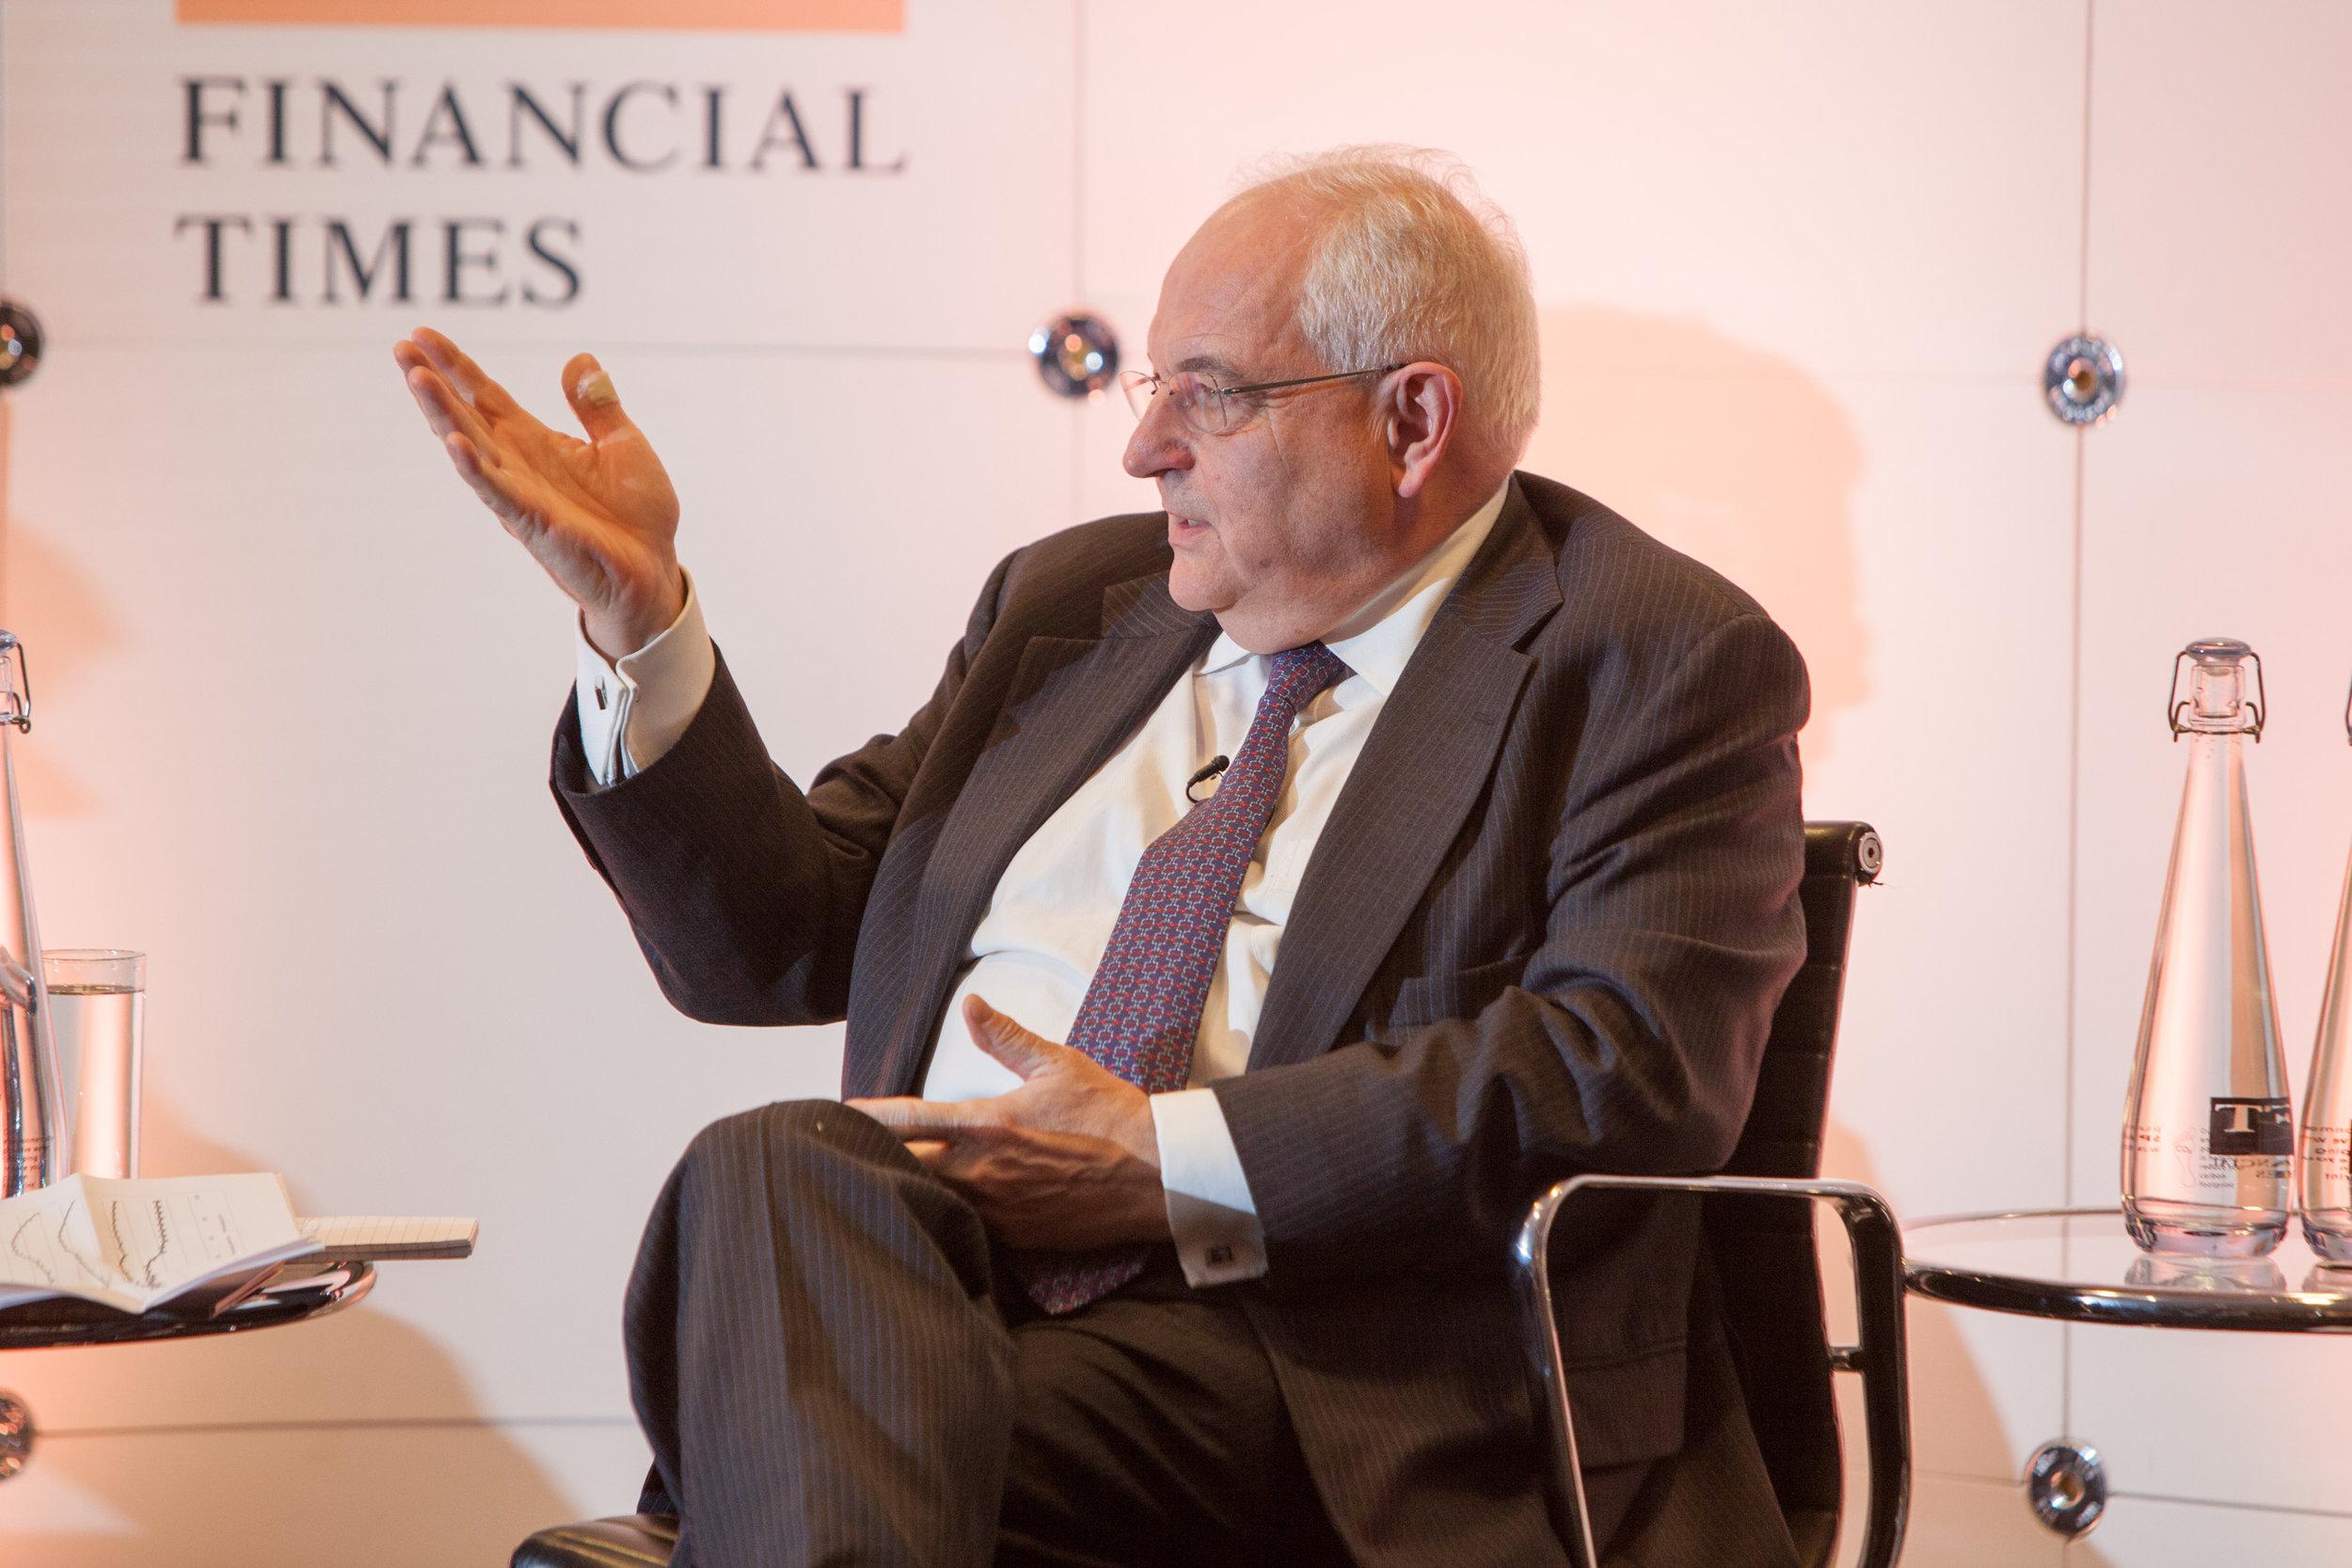 Martin Wolf CBE, Chief Economics Commentator, Financial Times